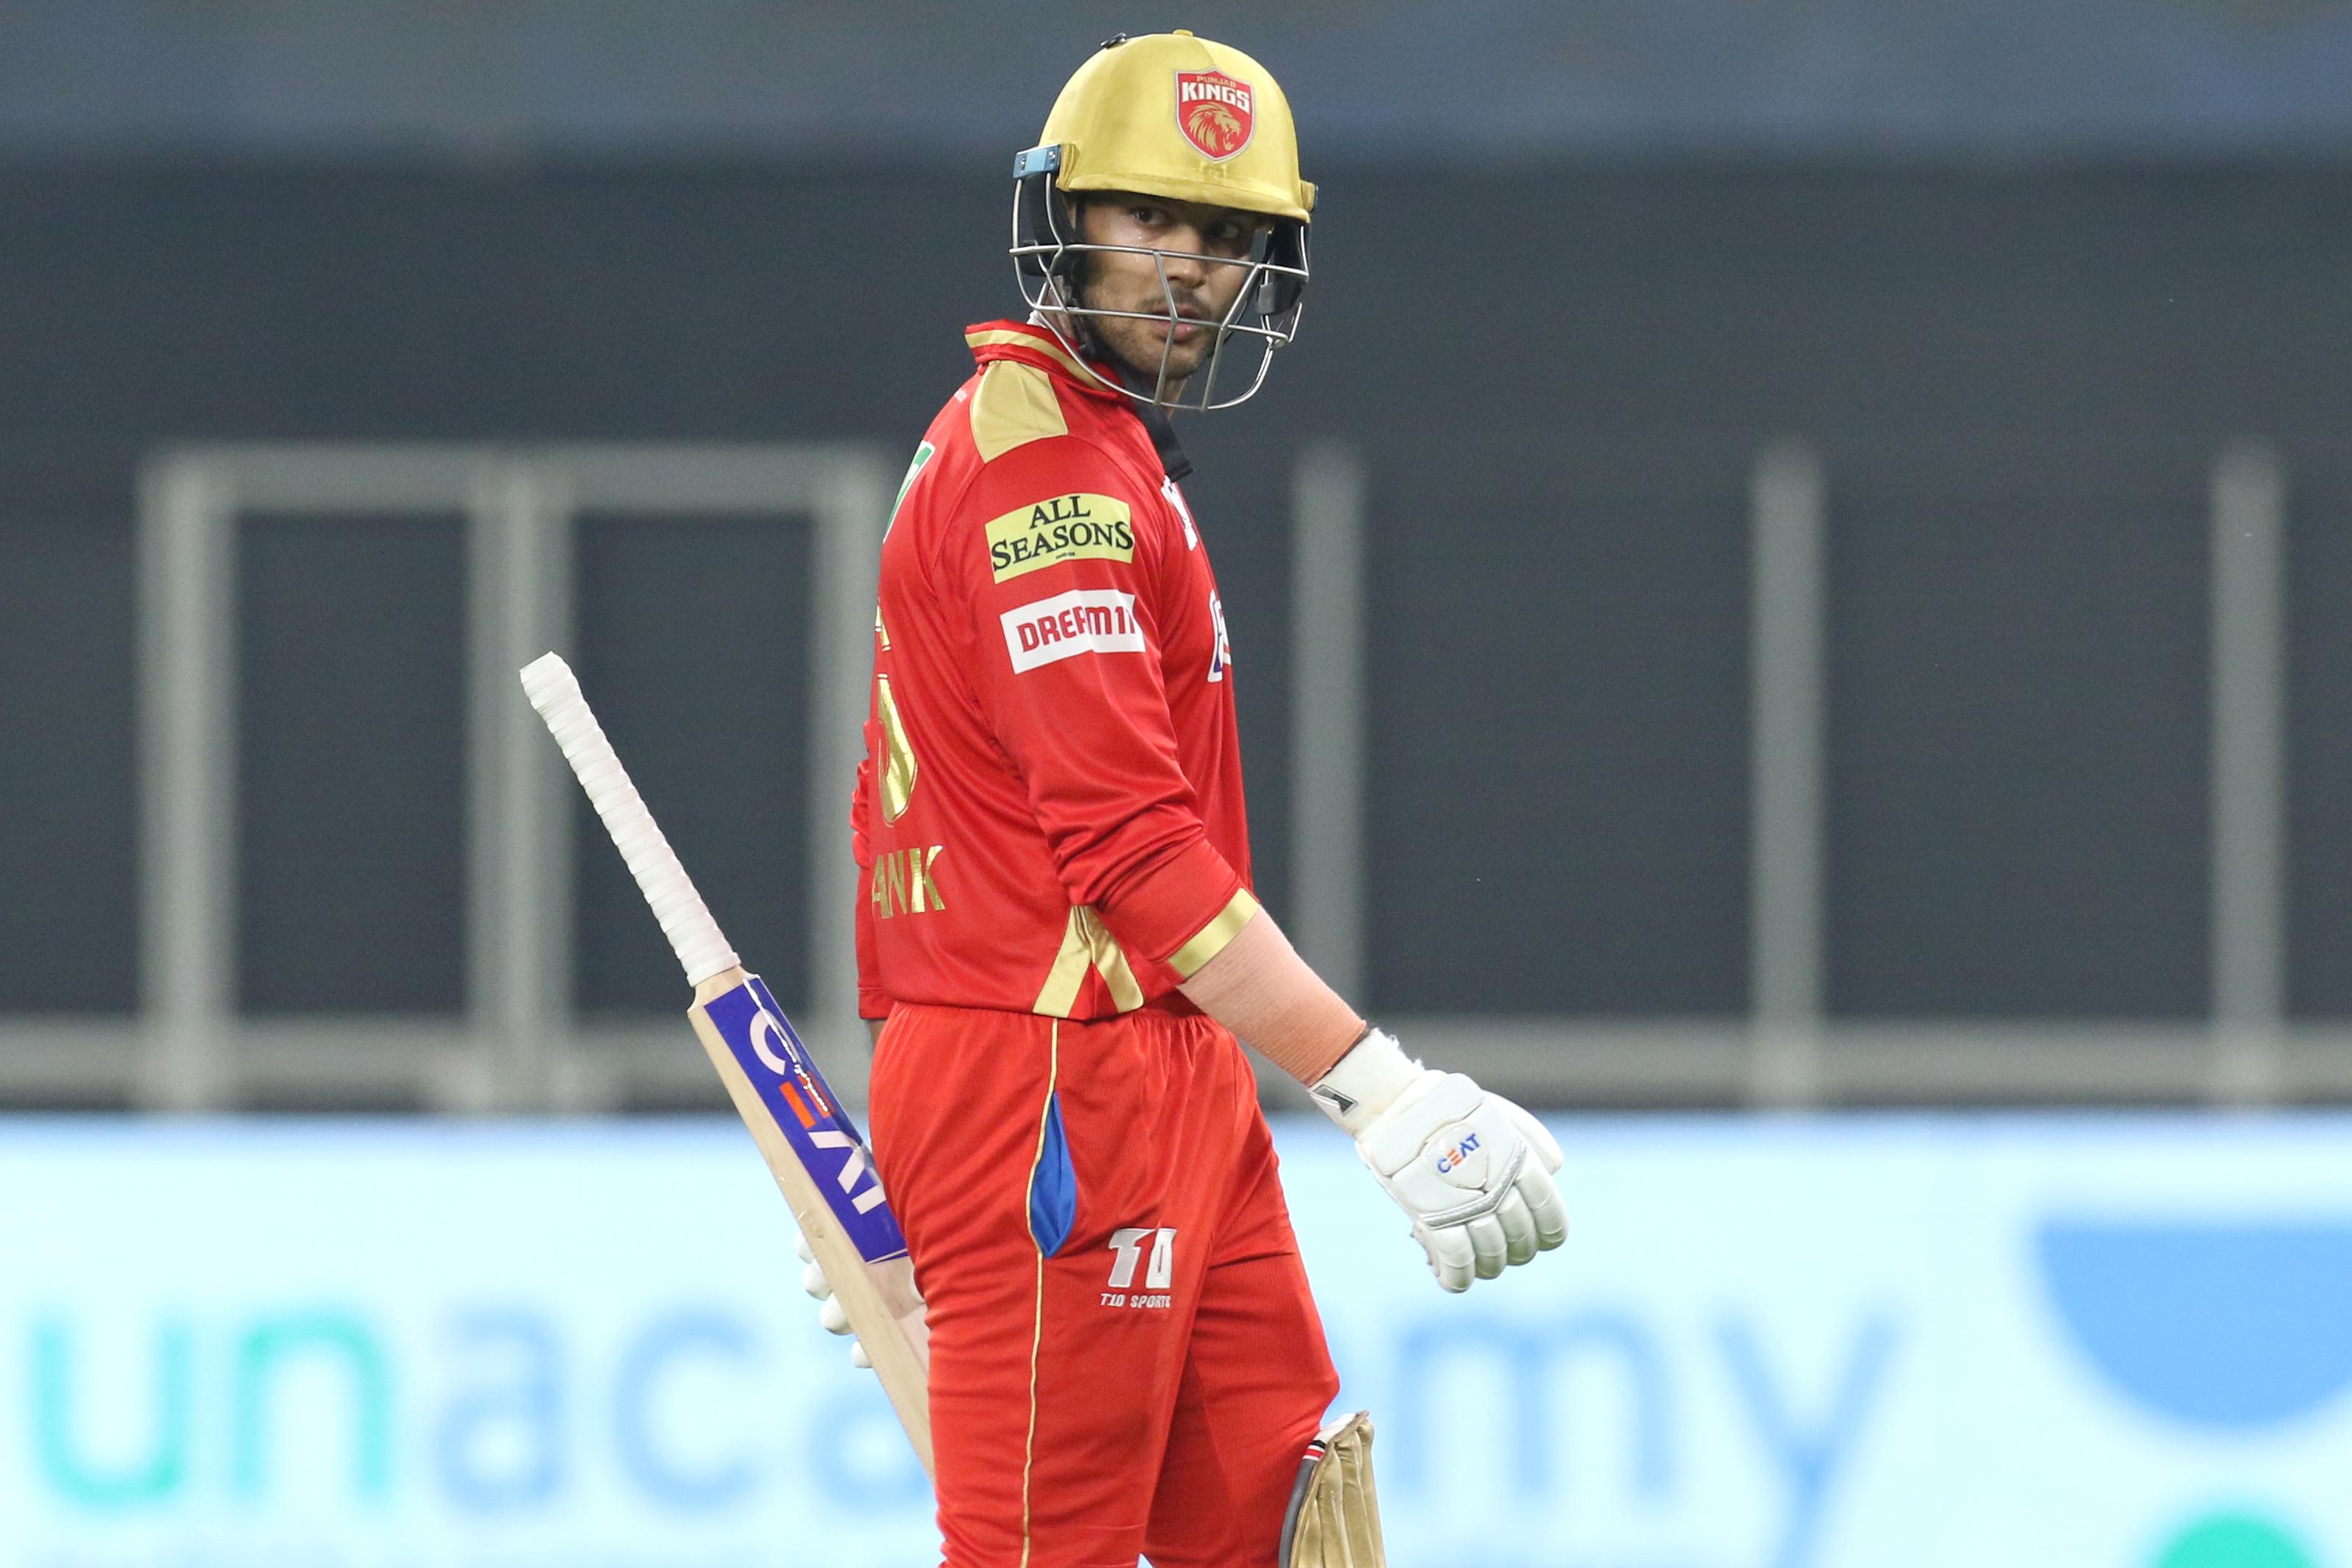 Mayank Agarwal finished one run short of an unbeaten ton // BCCI/IPL